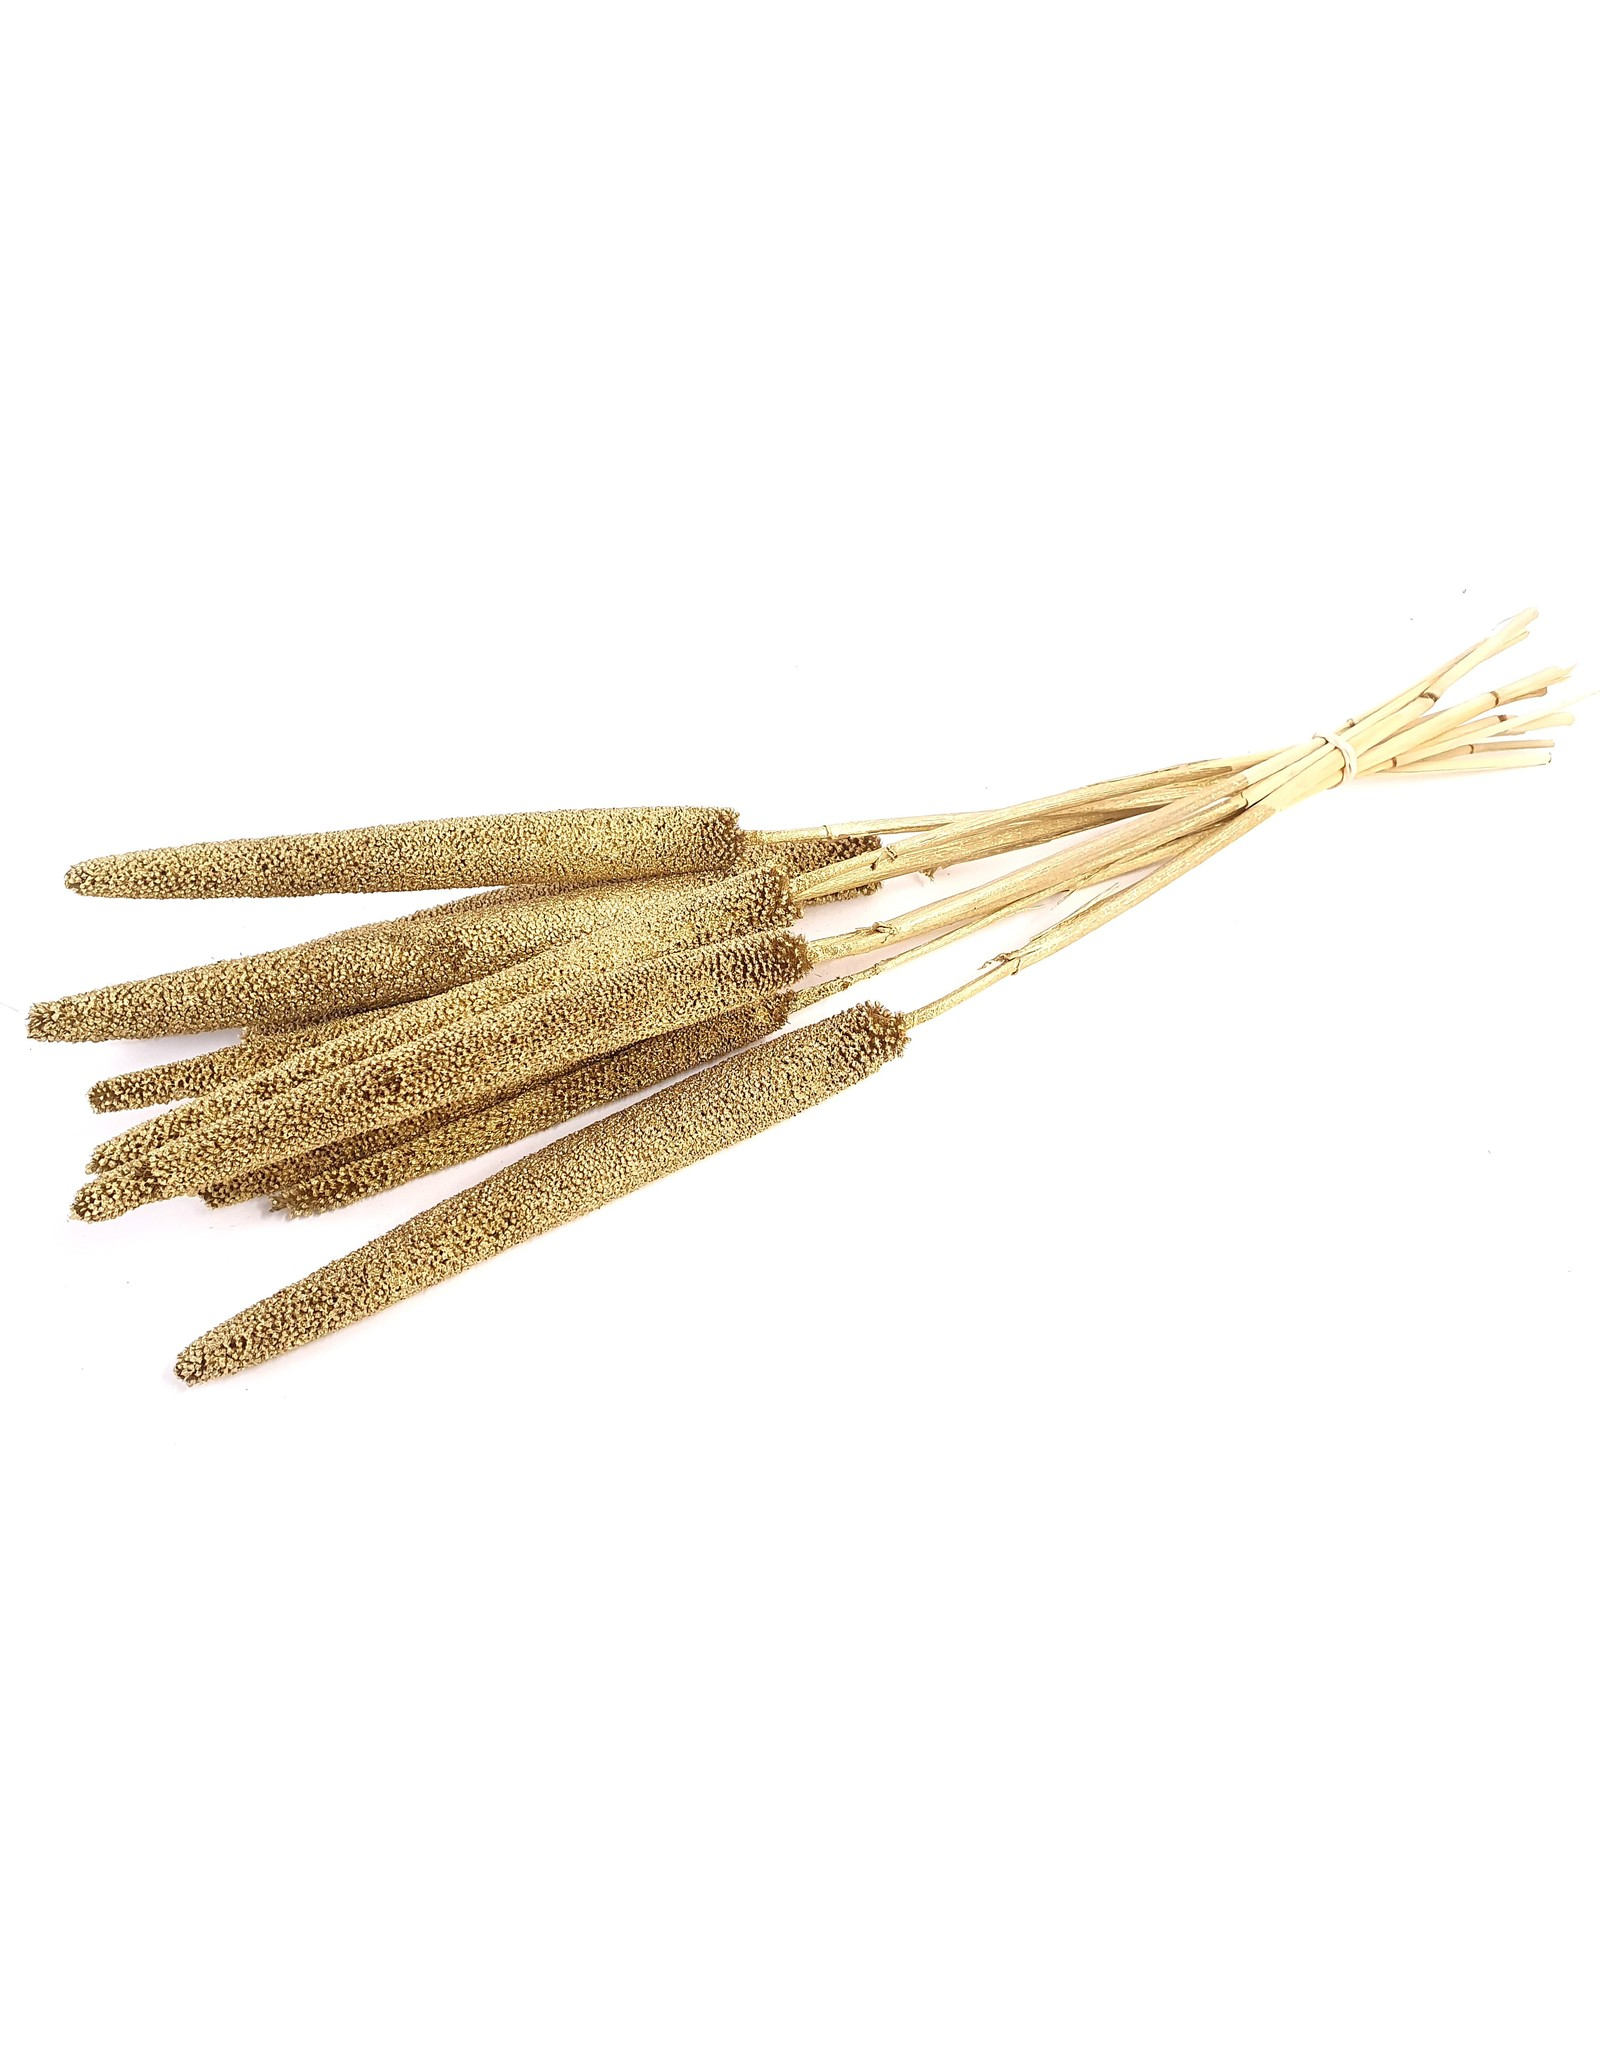 Babala on natural stem Gold x 100